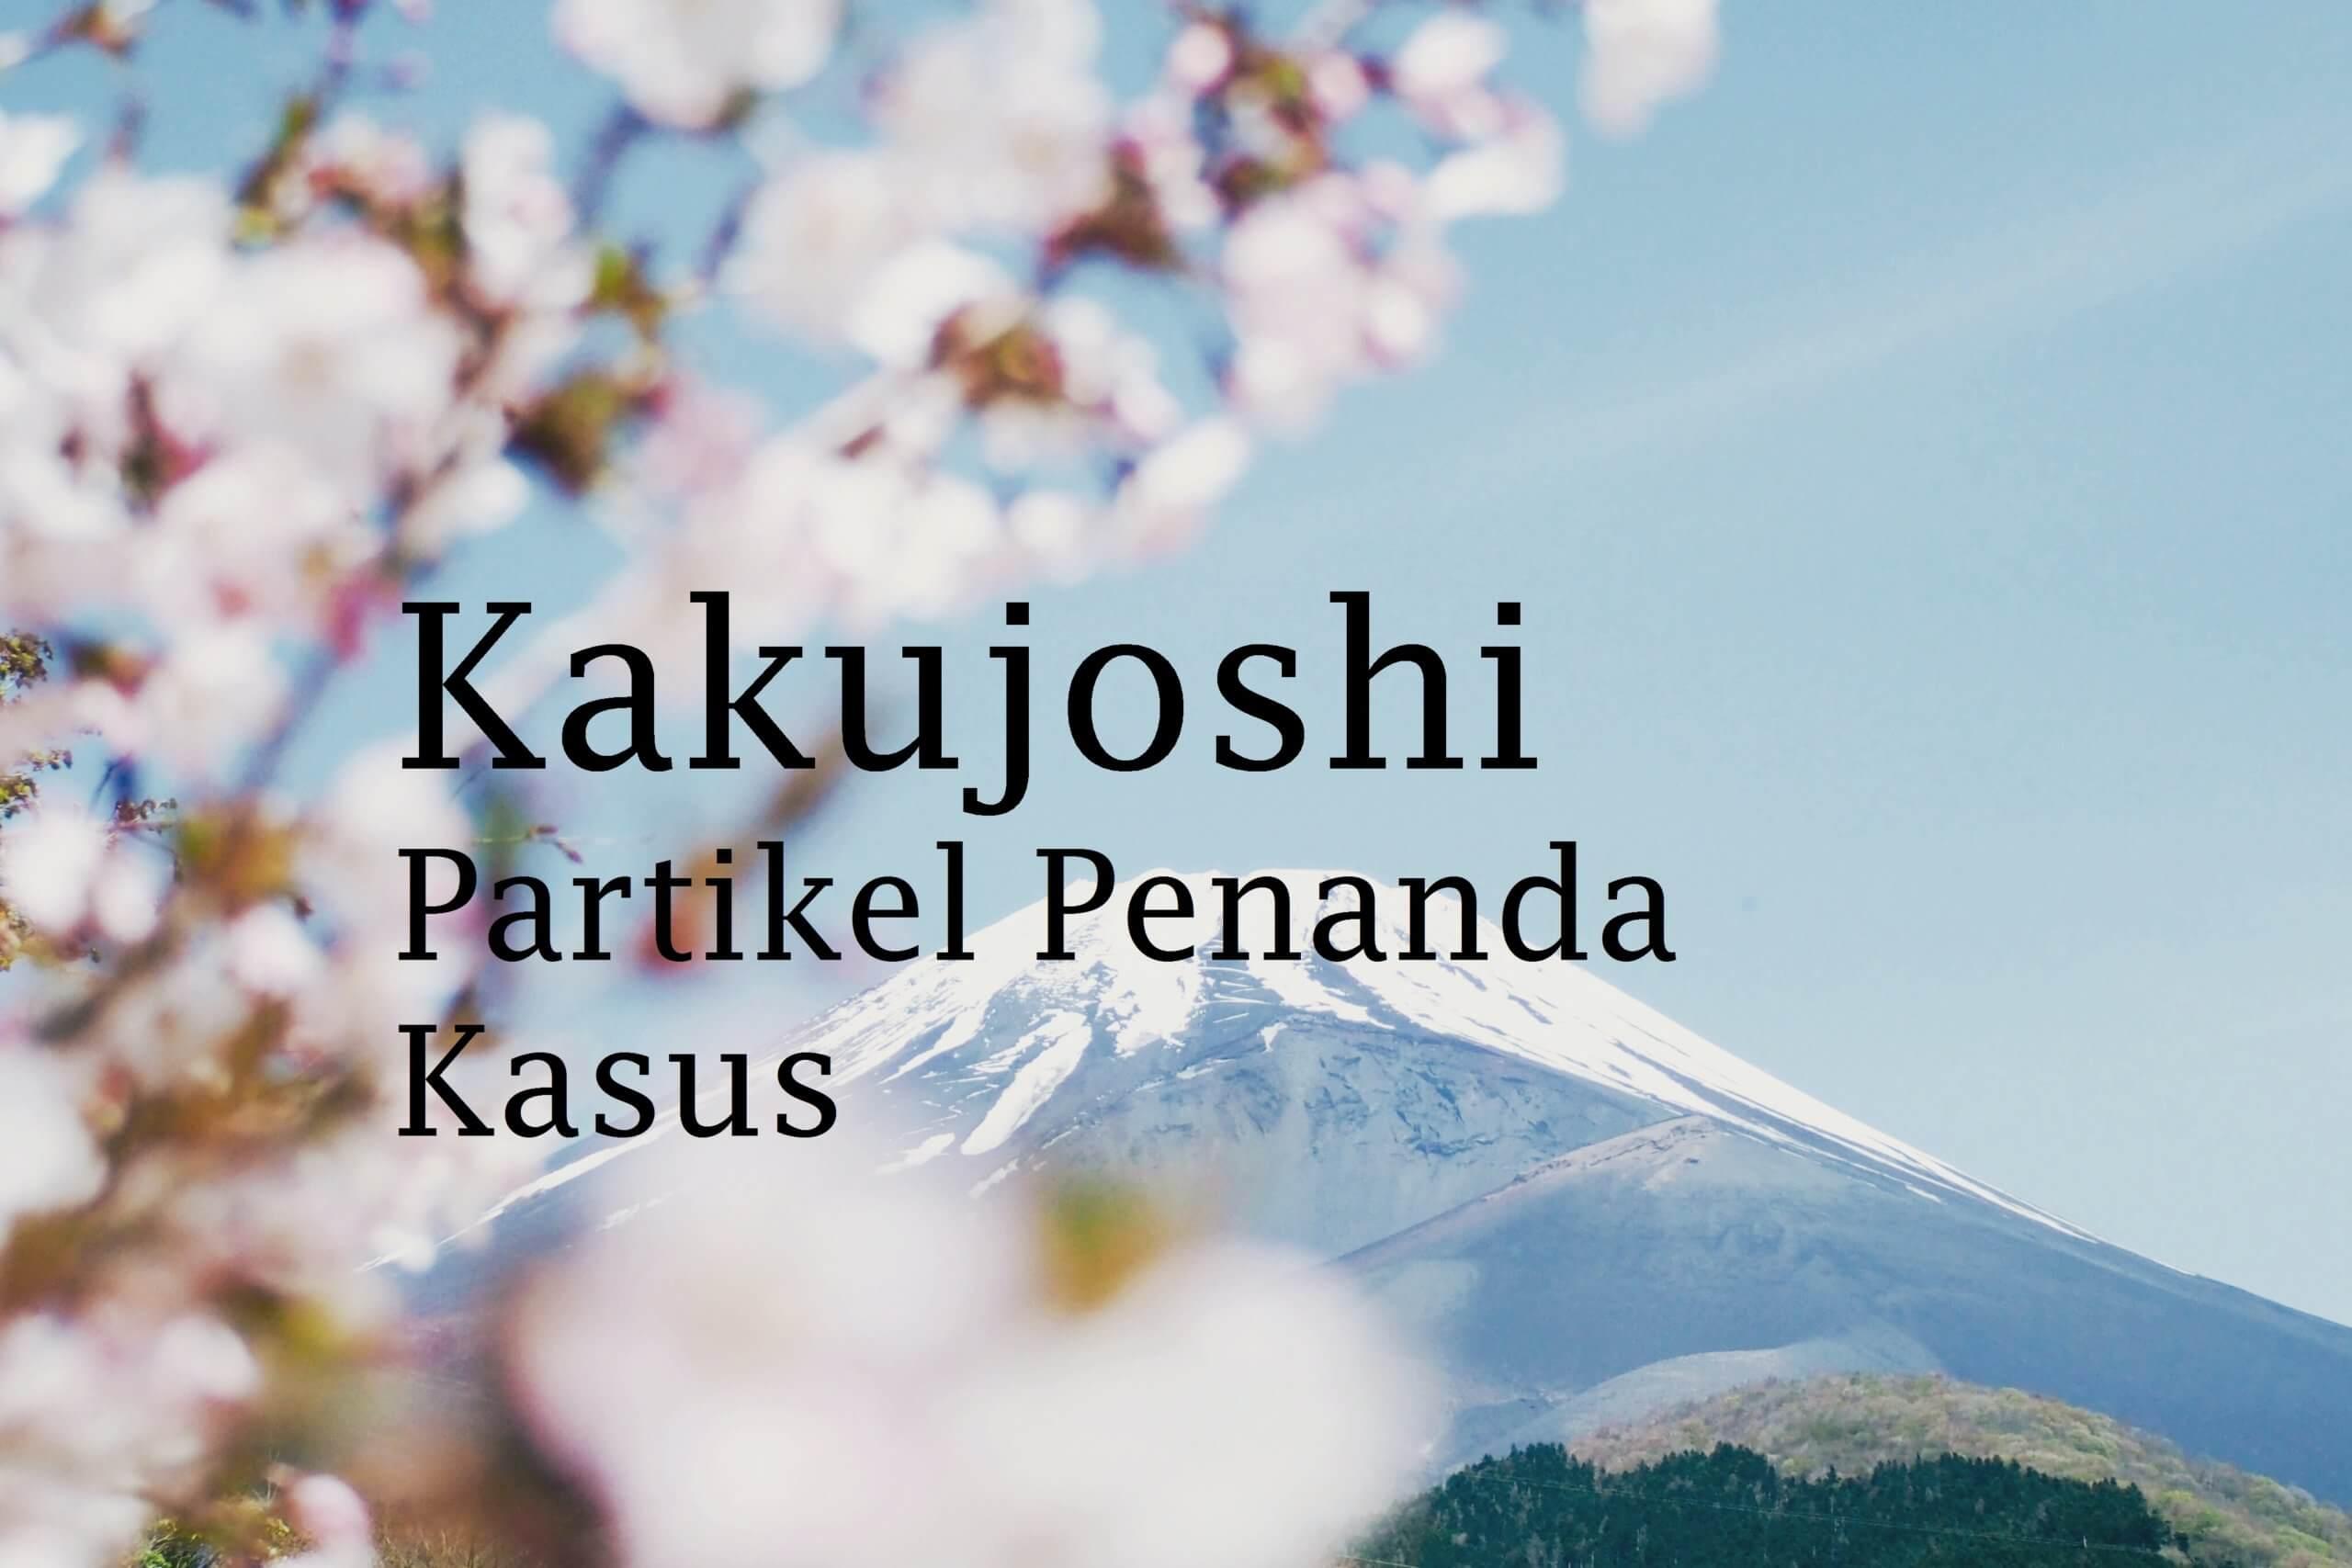 Kakujoshi (Partikel Penanda Kasus) – Belajar Bahasa Jepang